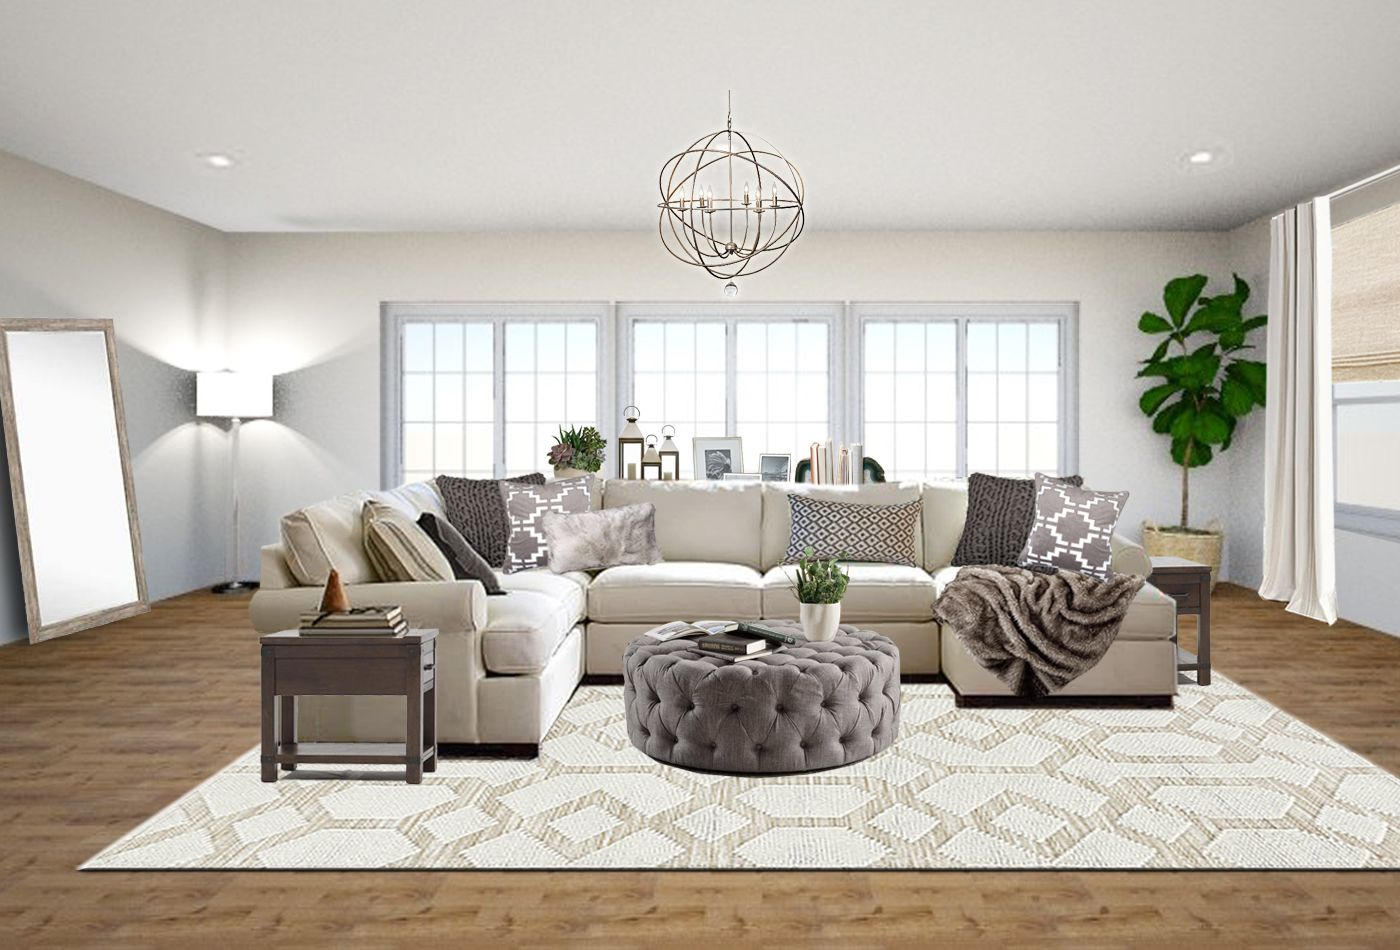 Transitional Living Room Online Interior Design Transitional Living Room Design Paint Colors For Living Room Neutral Living Room #neutral #transitional #living #room